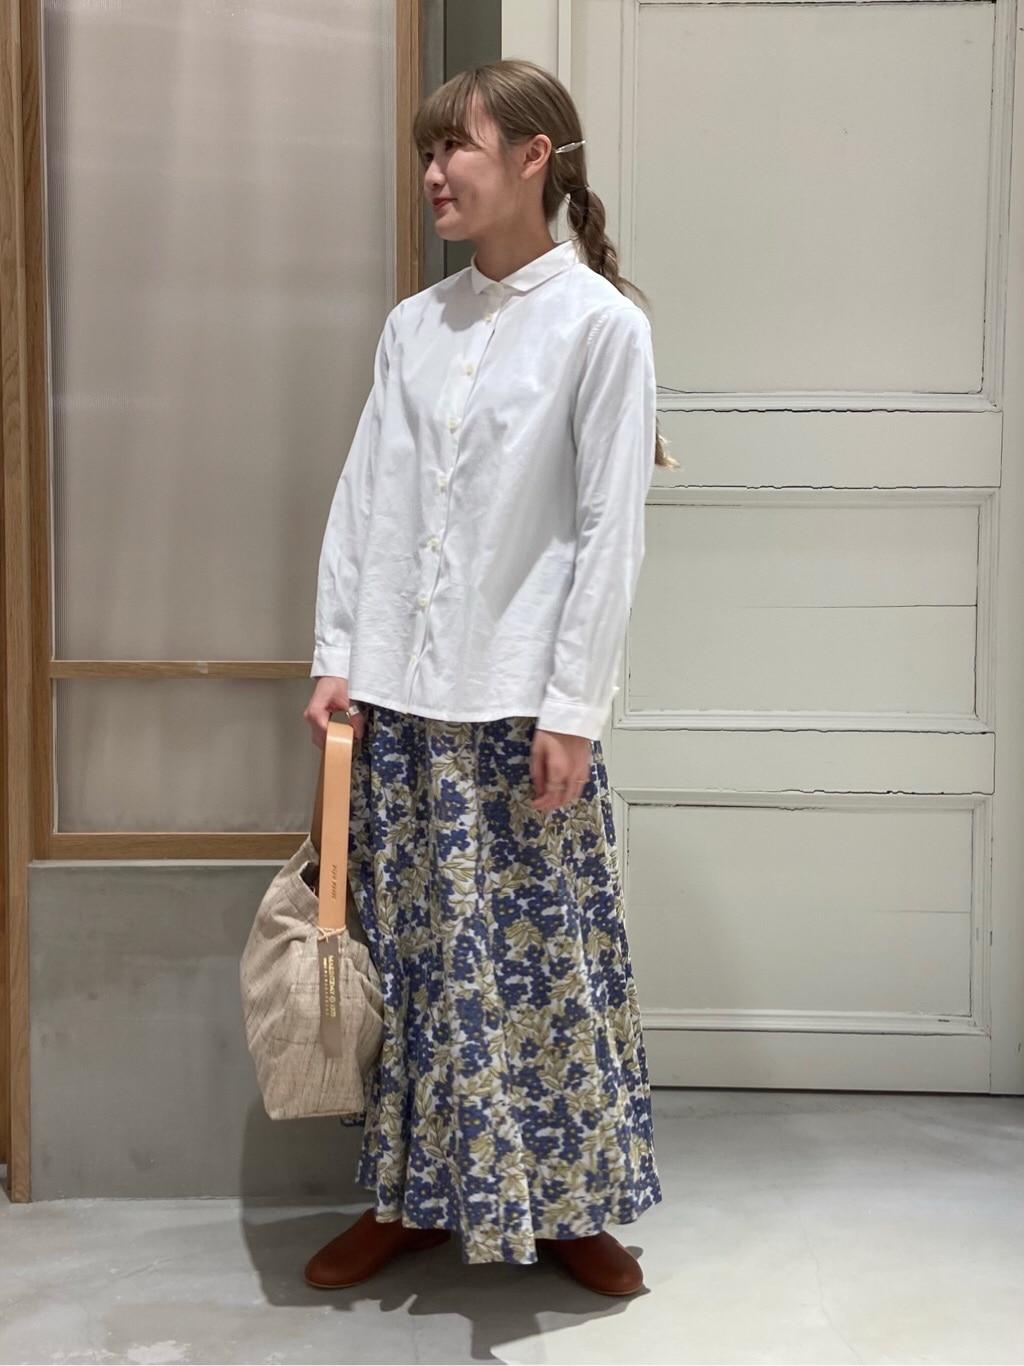 bulle de savon 渋谷スクランブルスクエア 身長:160cm 2021.01.14